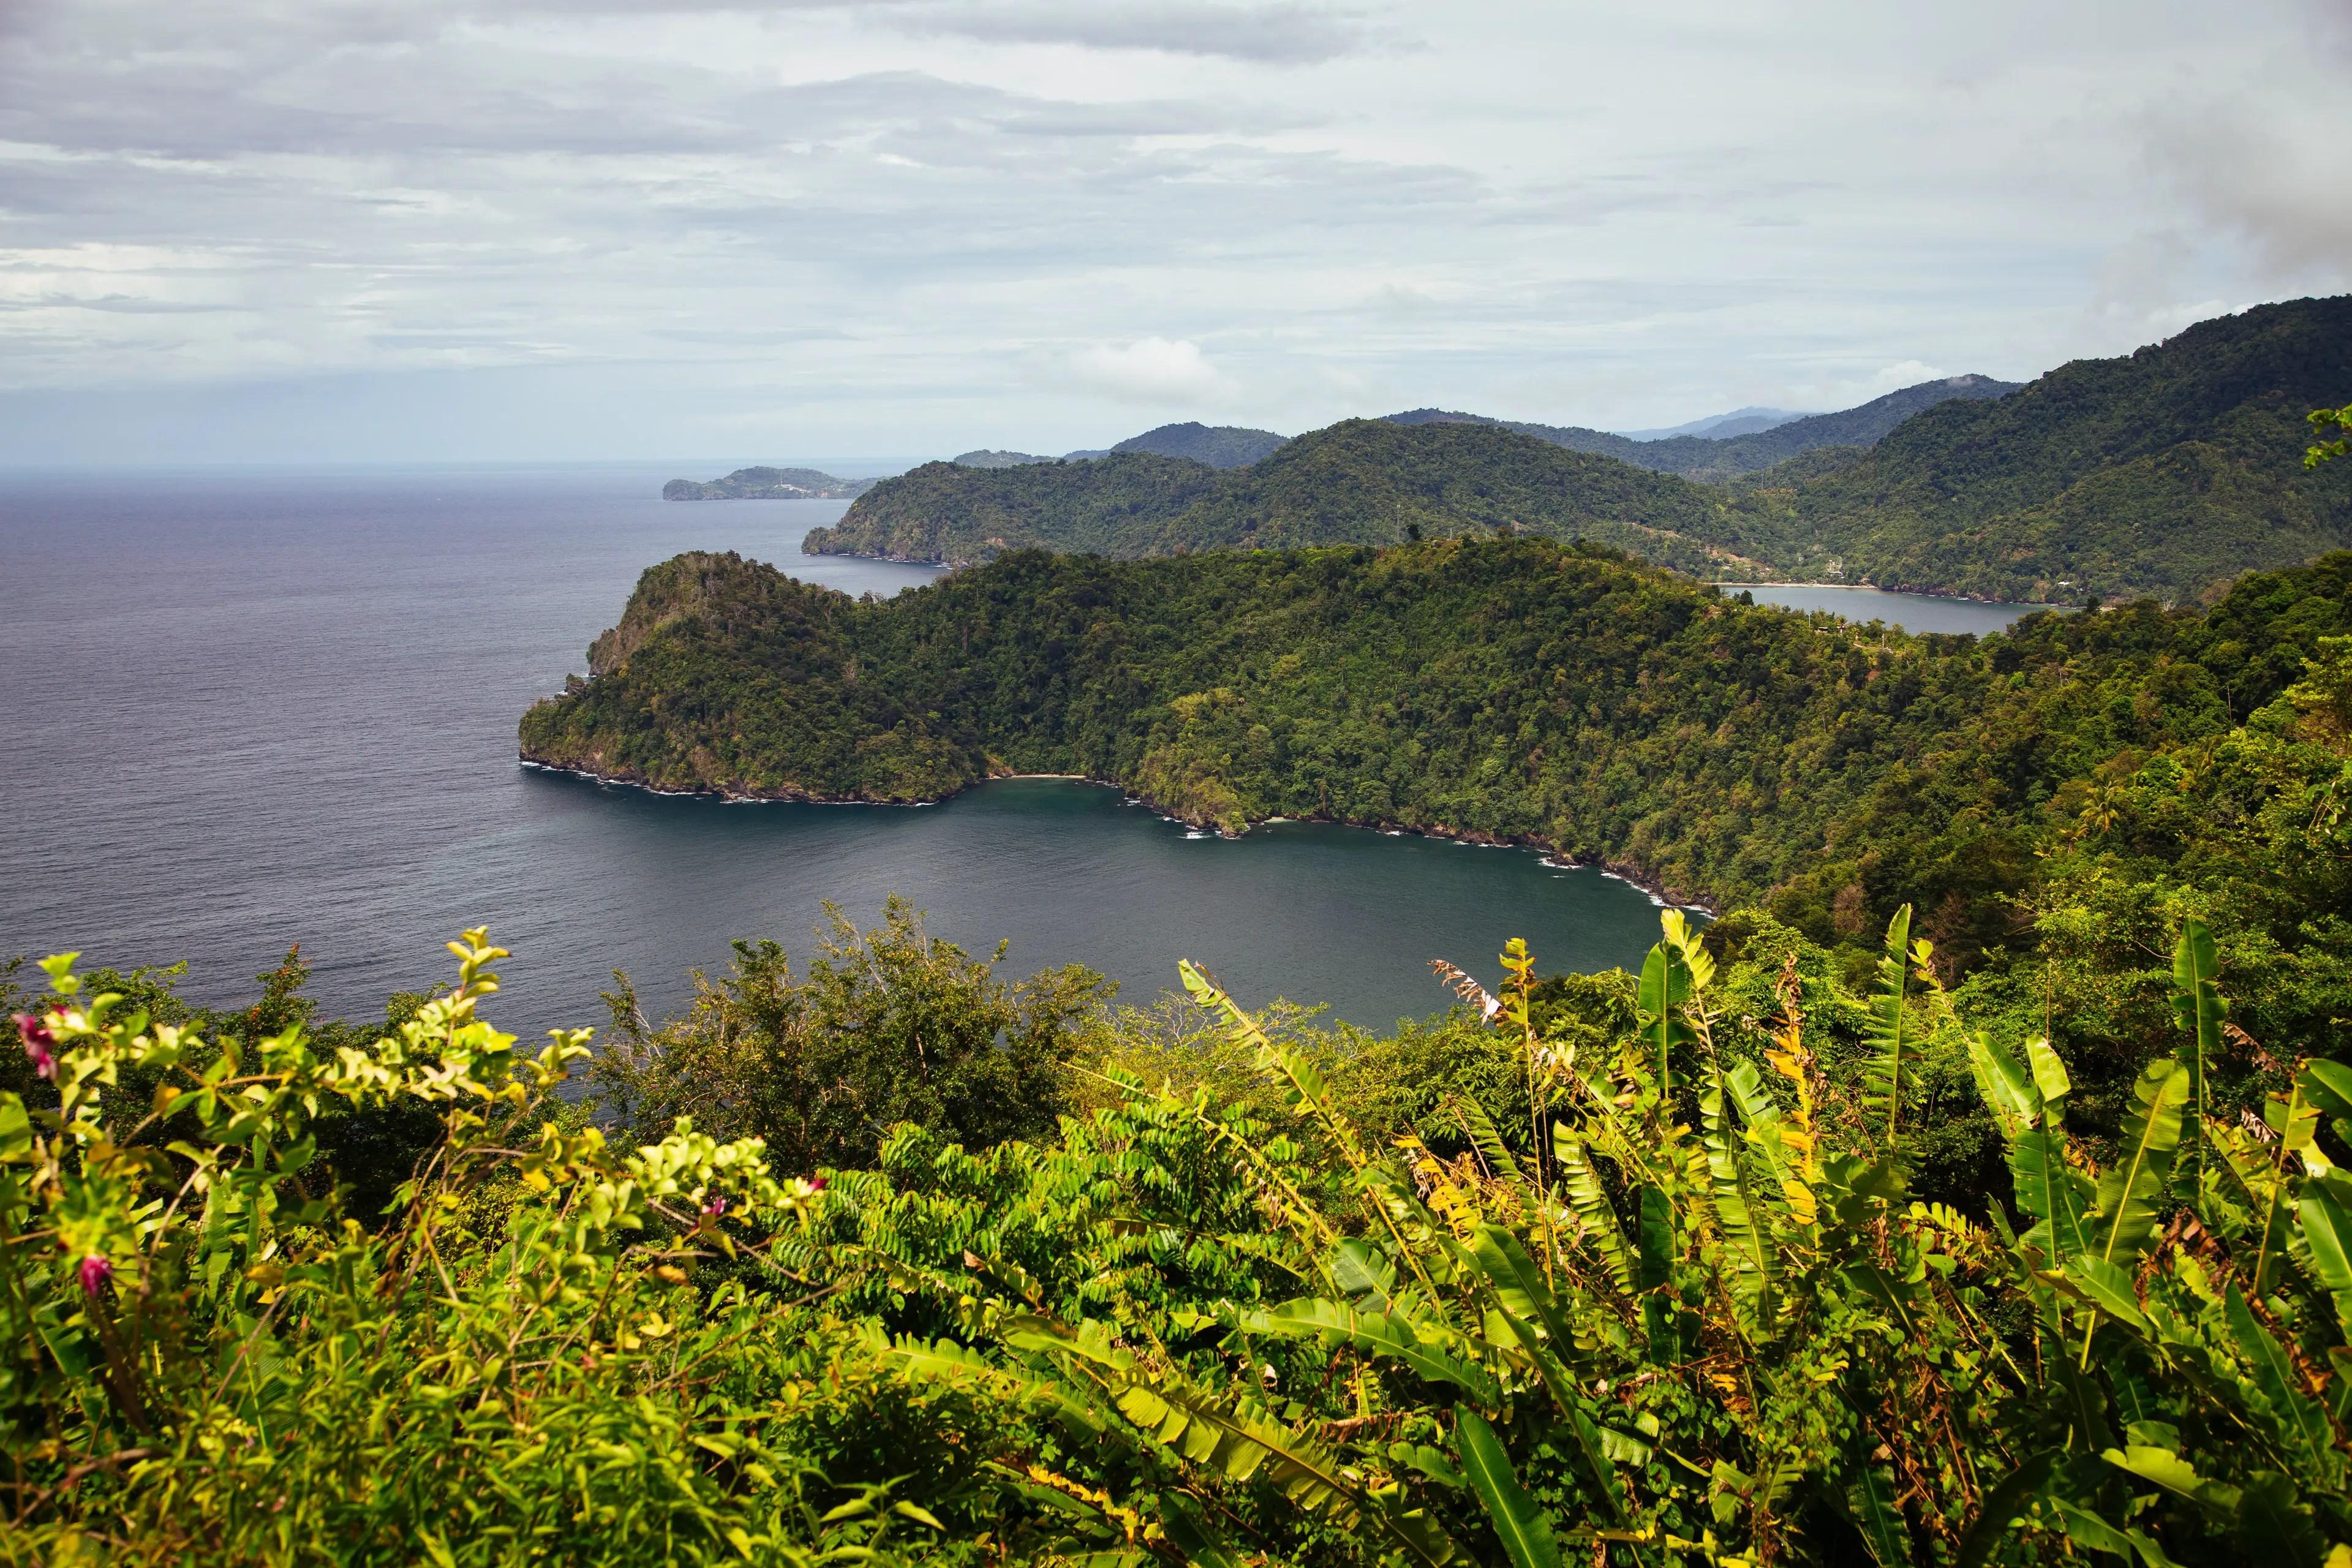 Photo of beautiful Trinidad and Tobago, Nicholas Pooran's home country